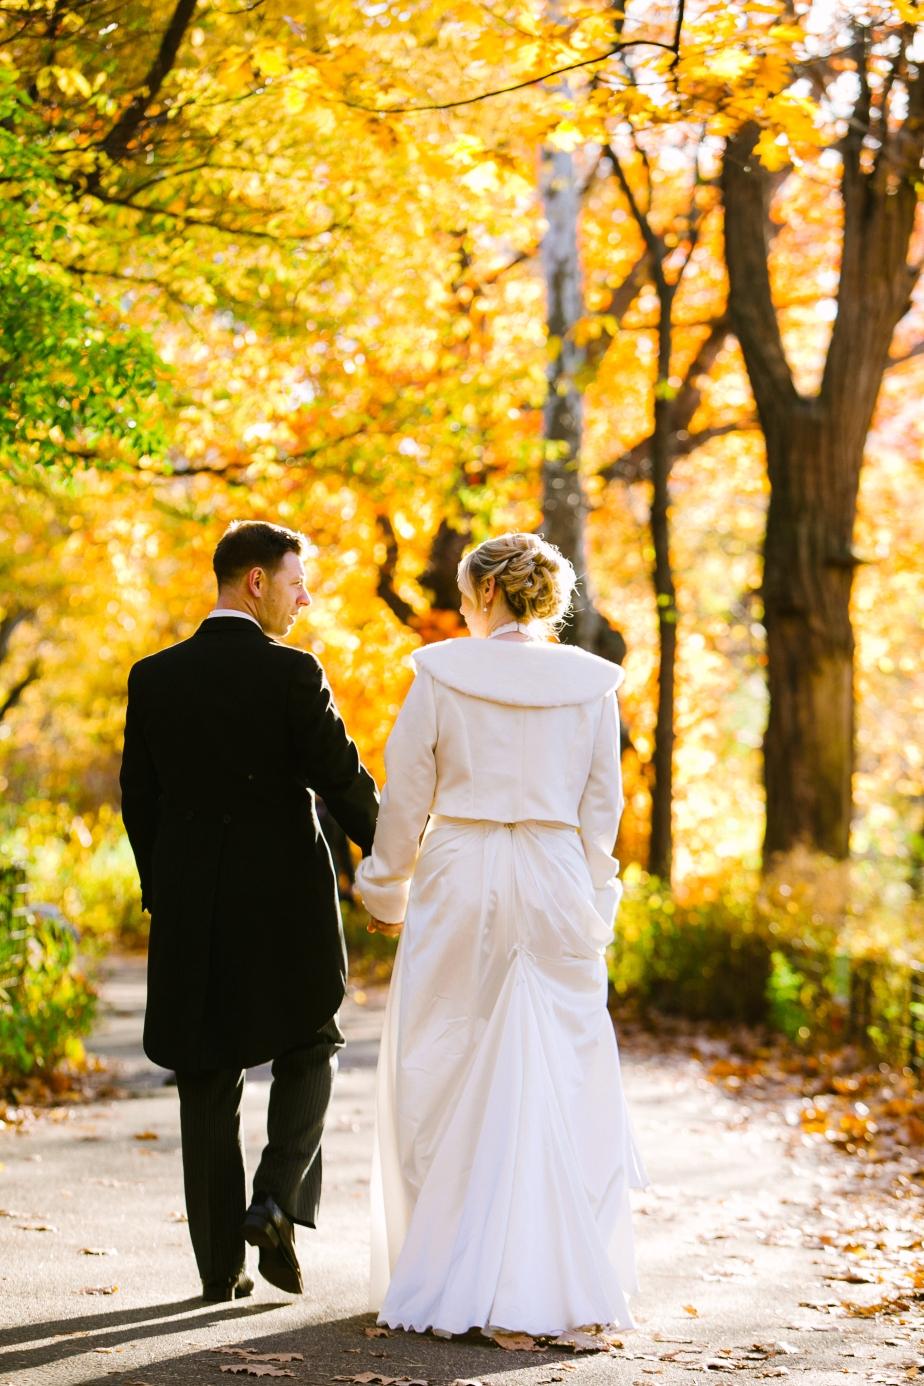 centralpark_ladiespavilion_wedding_EJ-189